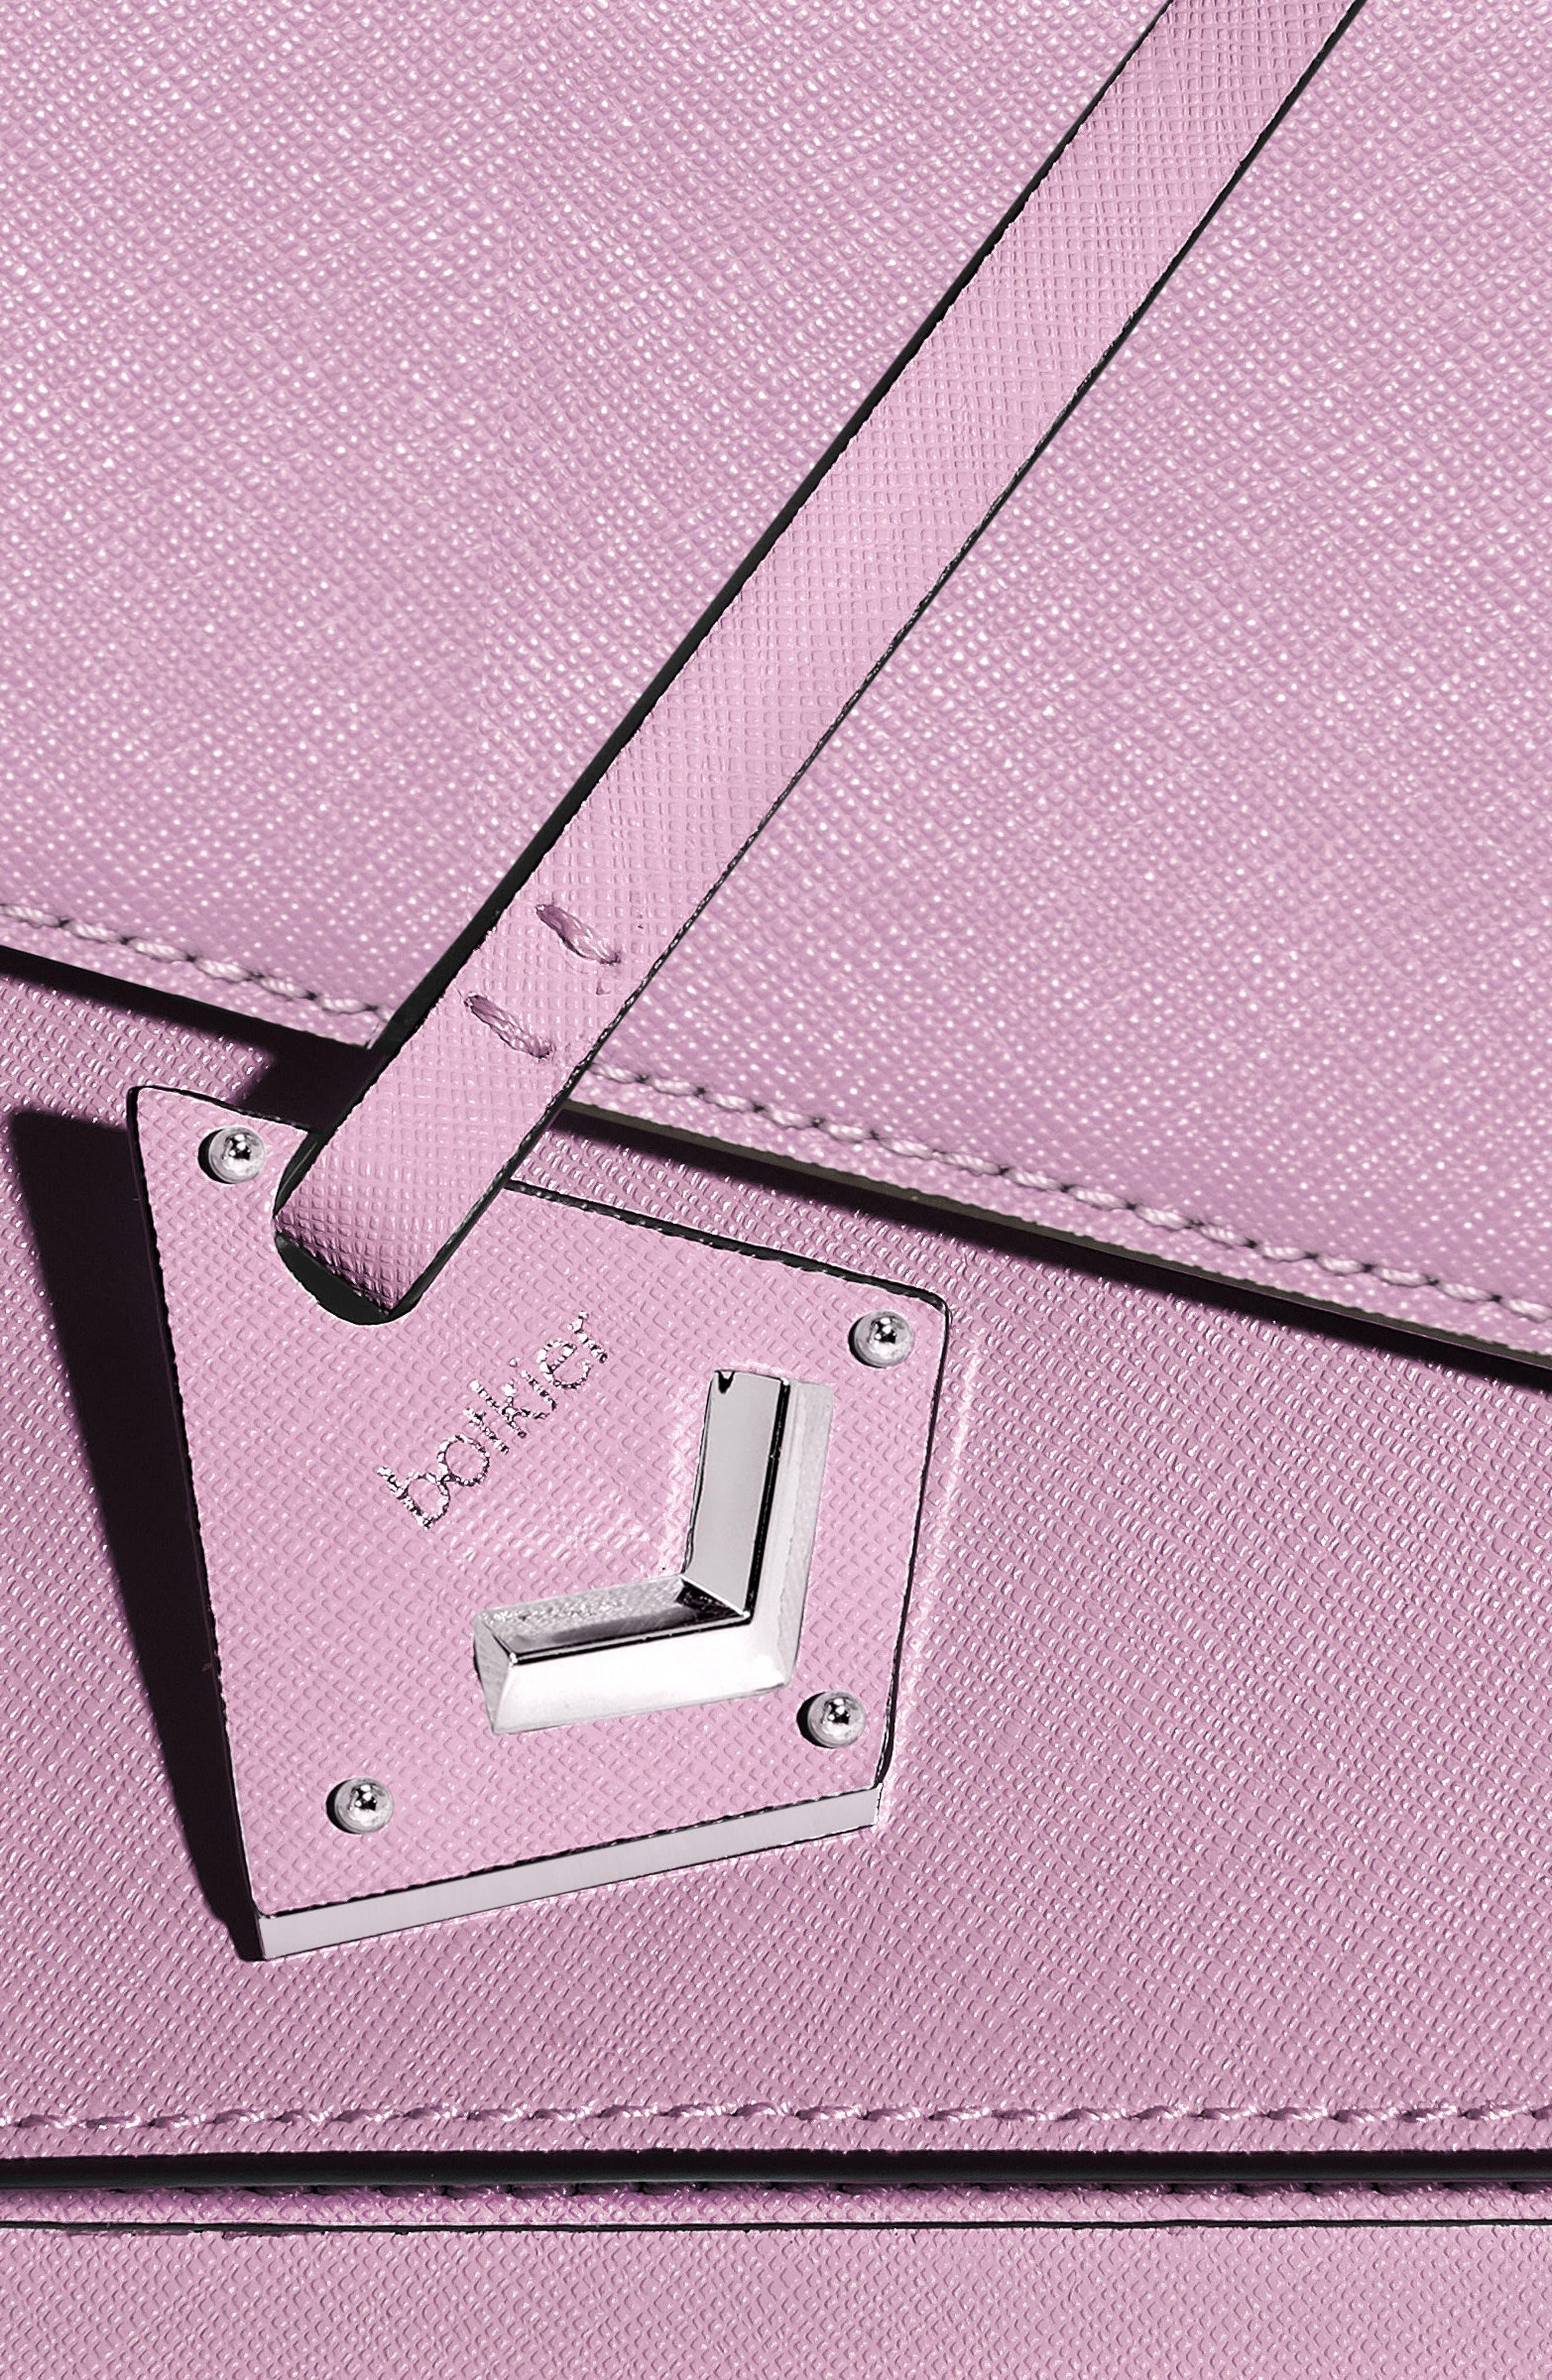 Cobble Hill Leather Crossbody Bag,                             Alternate thumbnail 108, color,